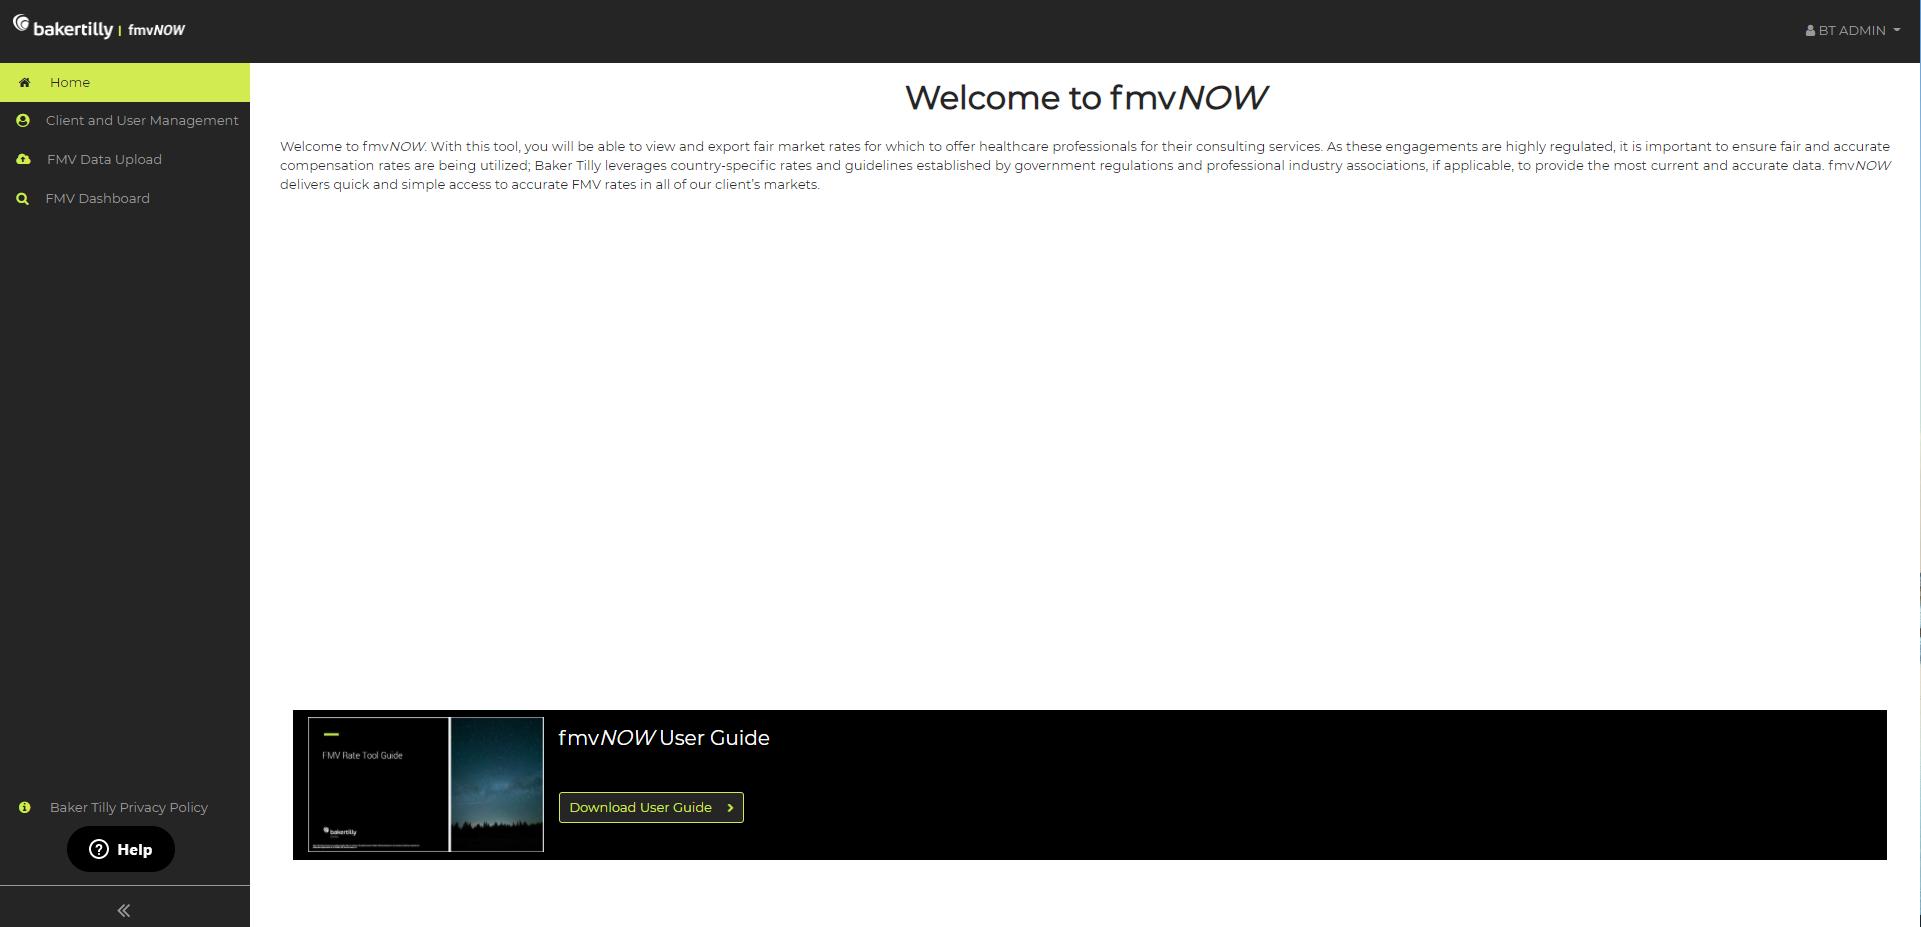 fmvNOW home screen for Fair Market Value (FMV) tool